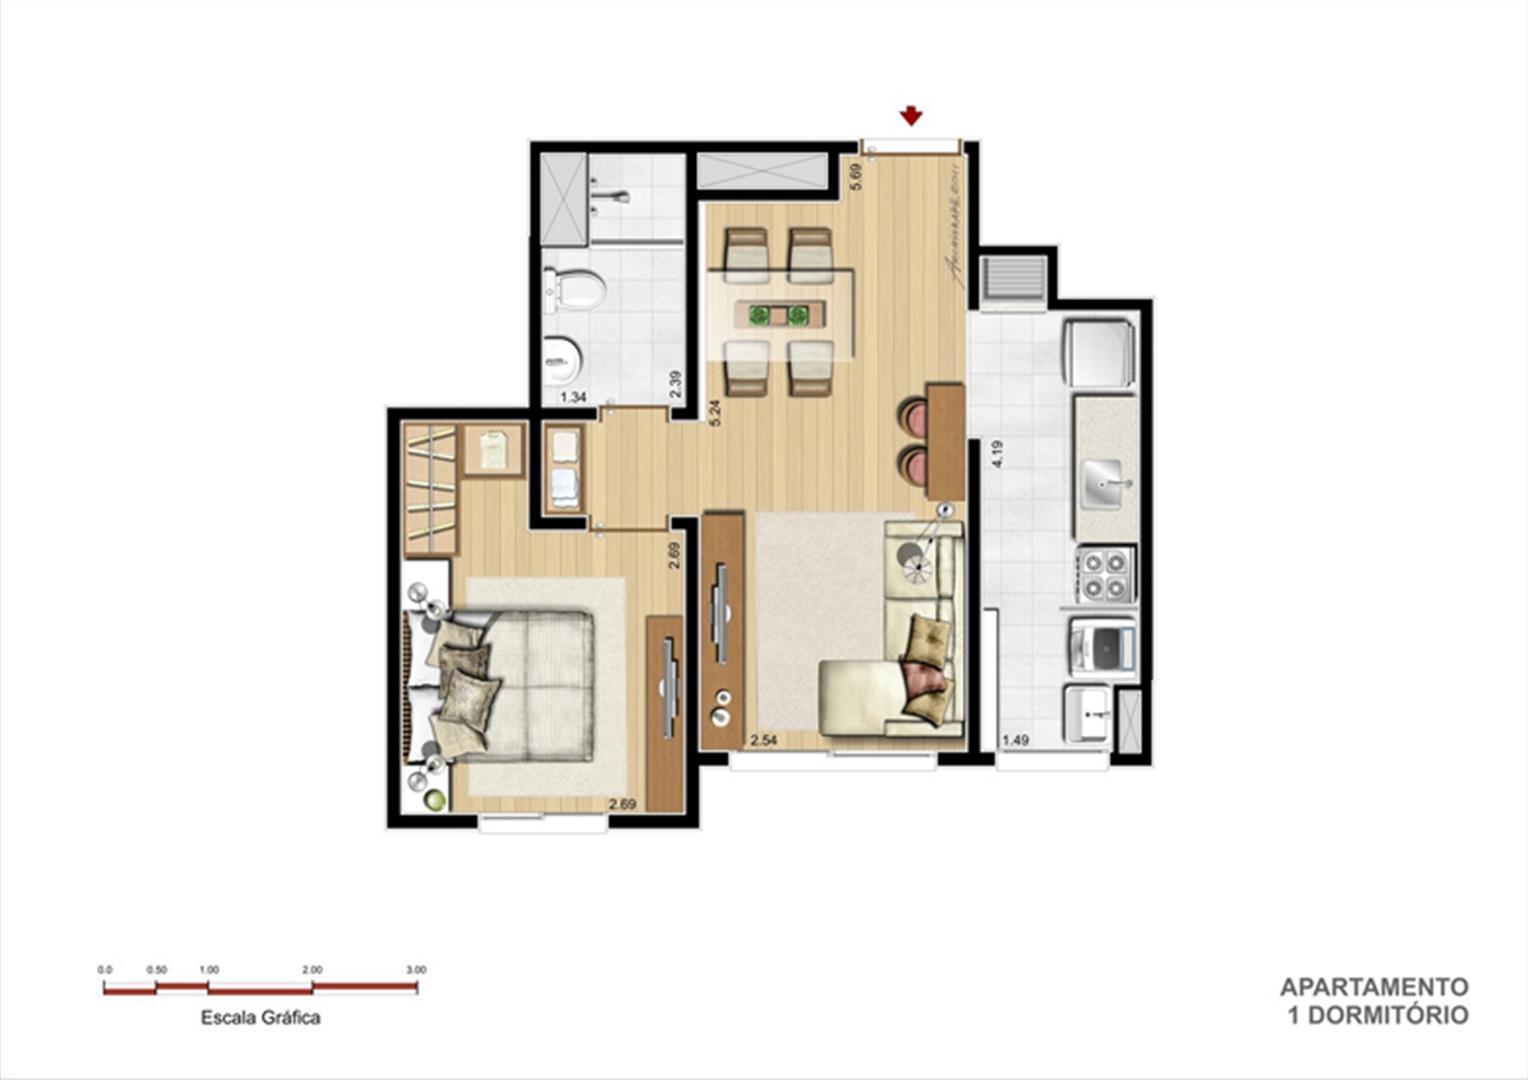 PLB - Tipo 1 dormitório | Supera Condomínio Clube – Apartamento na  Cavalhada - Porto Alegre - Rio Grande do Sul